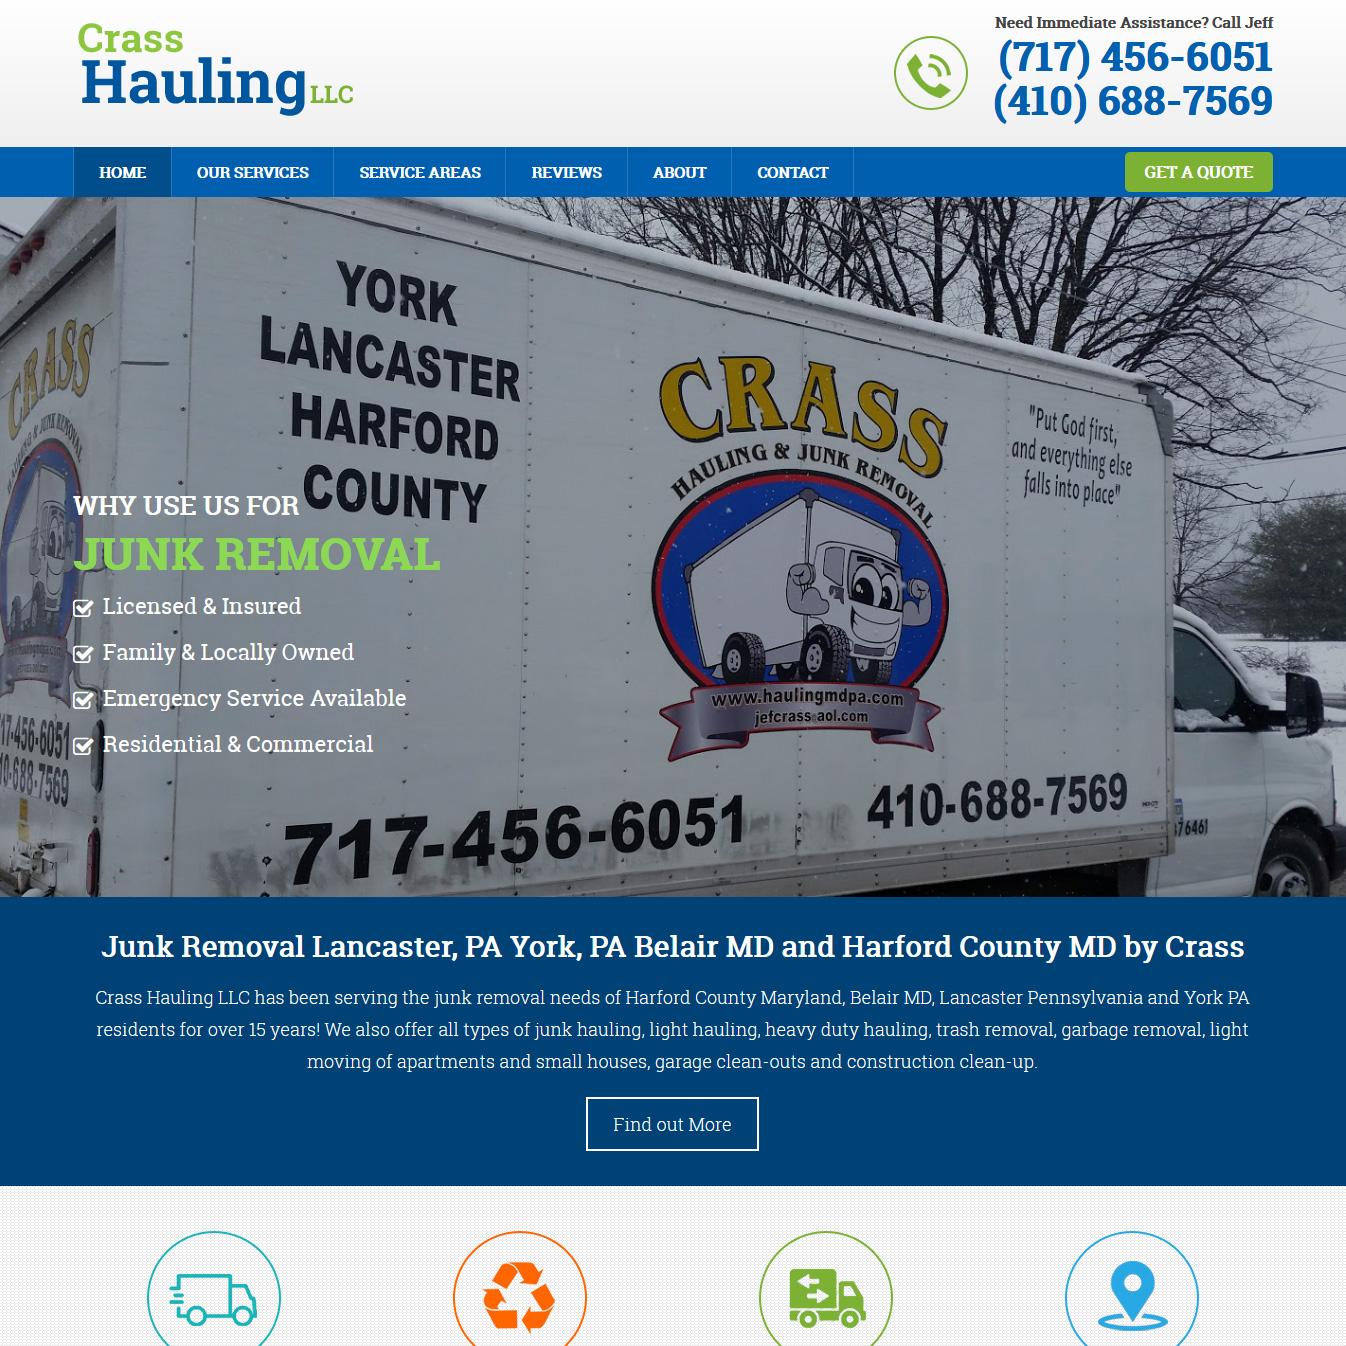 Crass Hauling moving website design